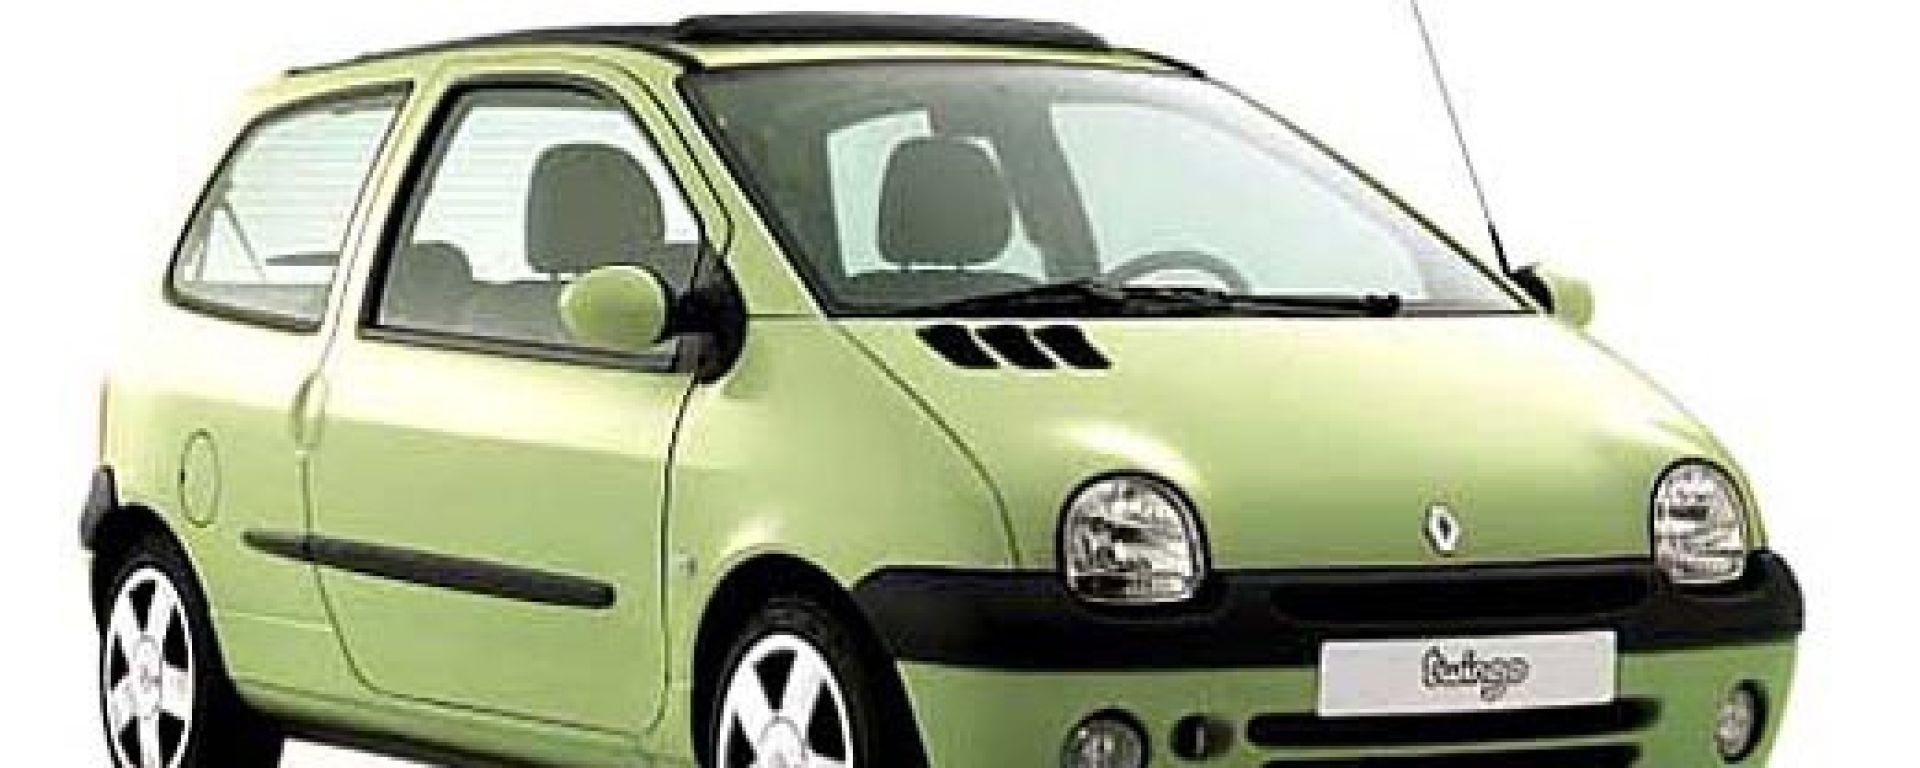 Anteprima:Renault Twingo 2005